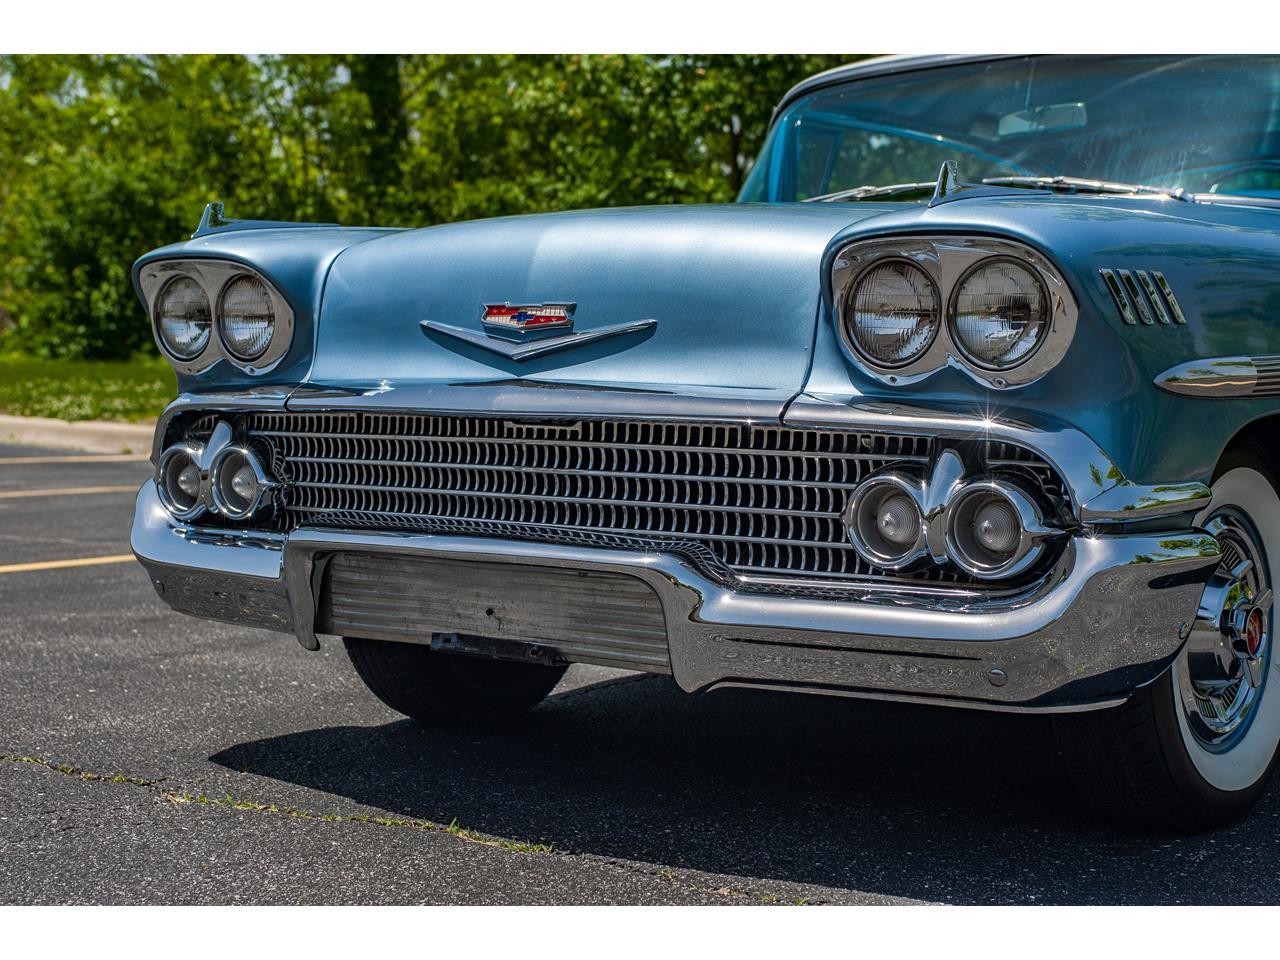 Large Picture of Classic '58 Impala located in O'Fallon Illinois - $62,000.00 - QB9Q